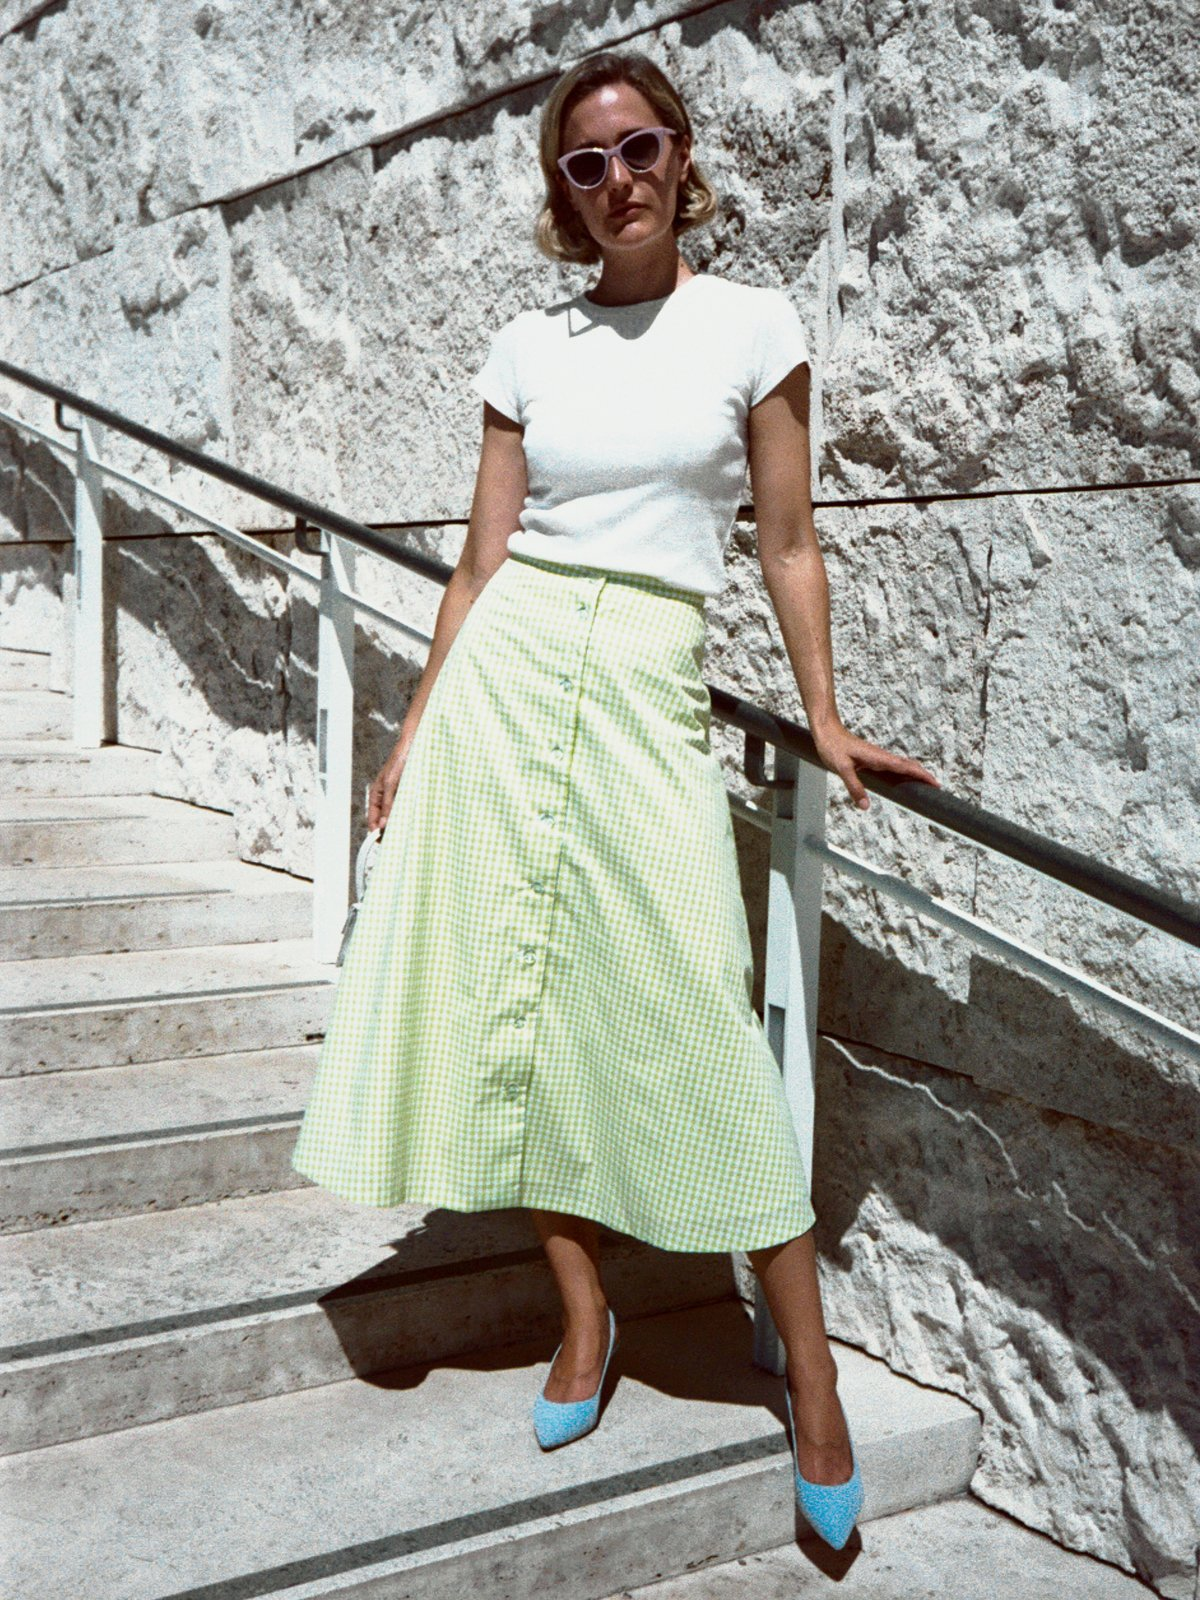 Marais USA Capsule Clothing Collection